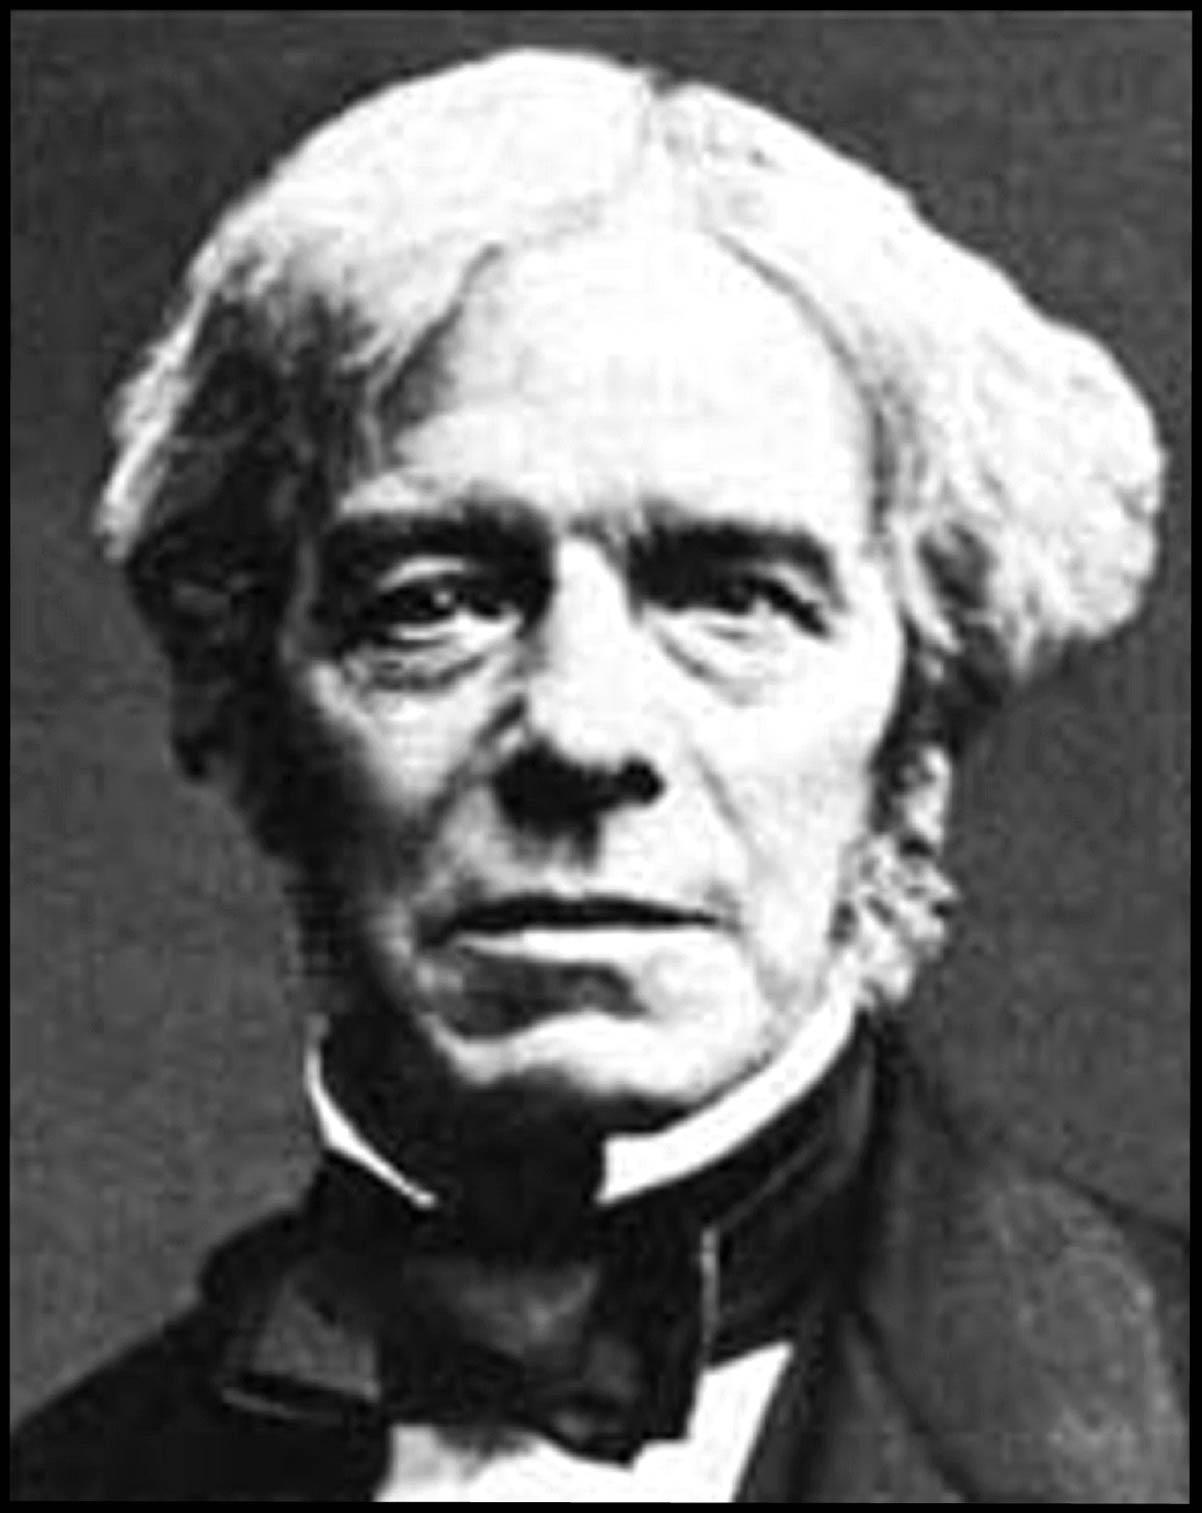 poza despre faraday